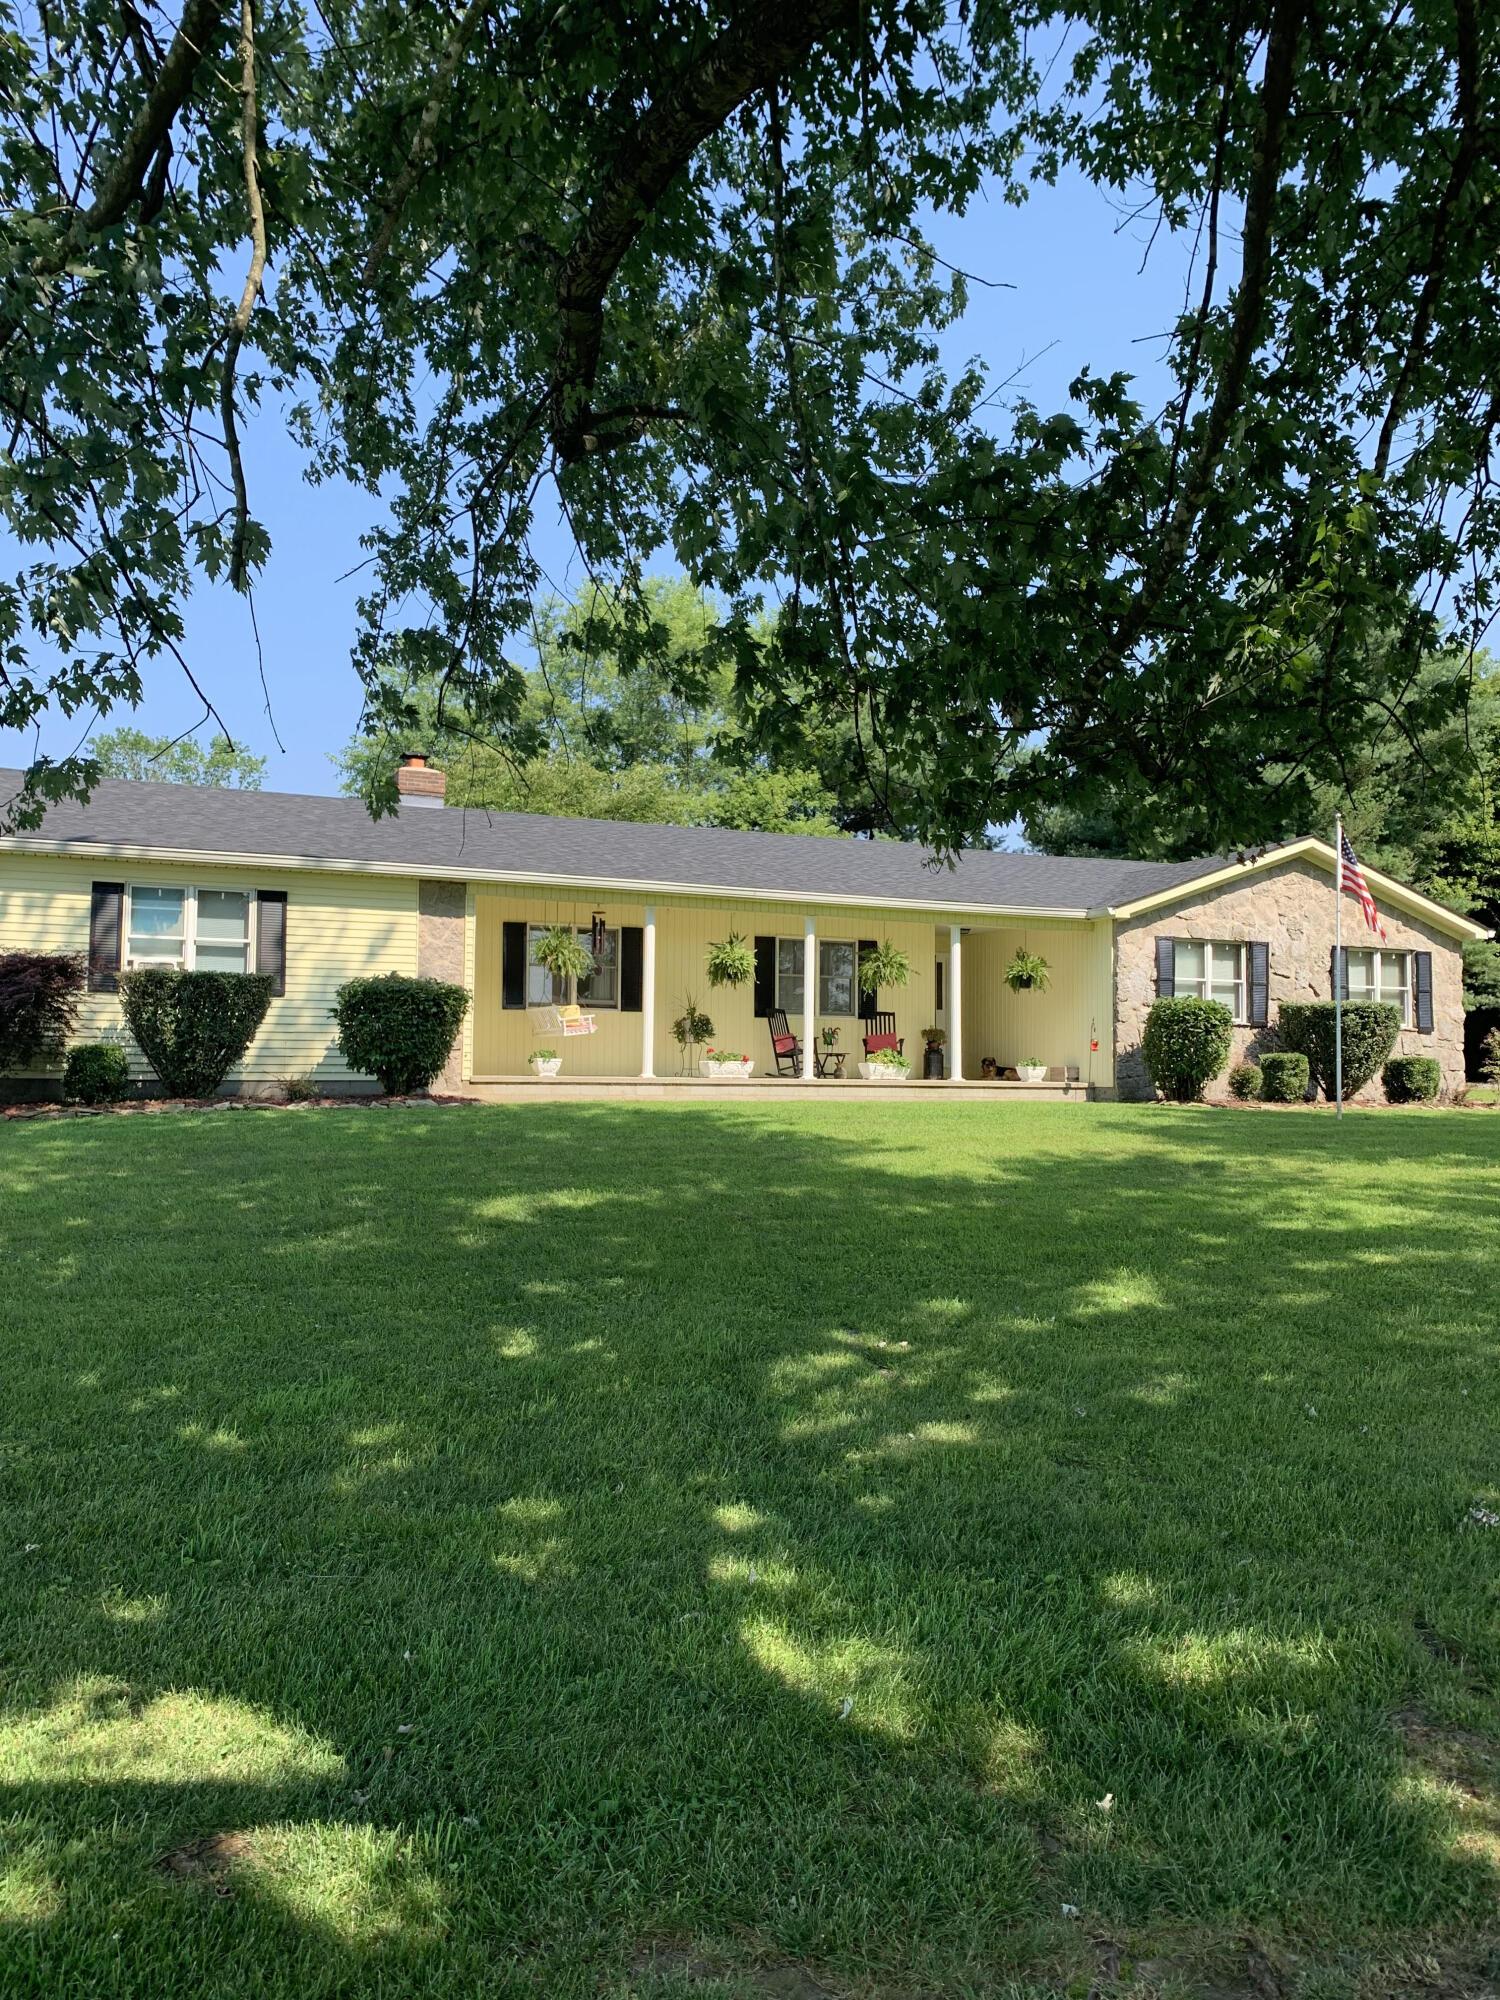 4606 Woodrum Ridge Road, Liberty, KY 42539